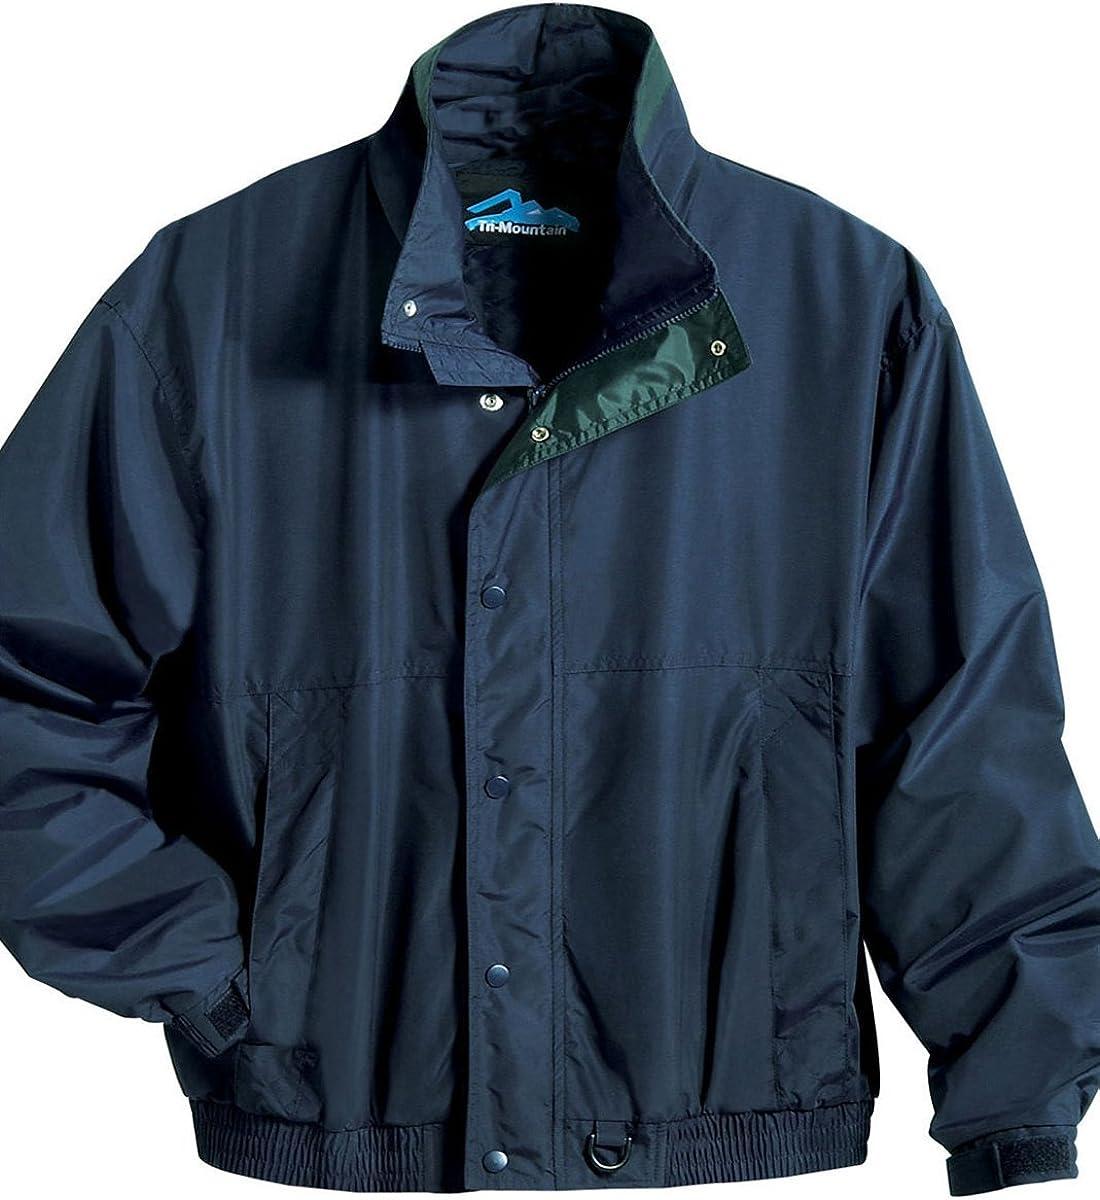 Men Toughlan Windproof/Water Resistant Storm Flap Shell Jacket (6 Color,S-6XLT)